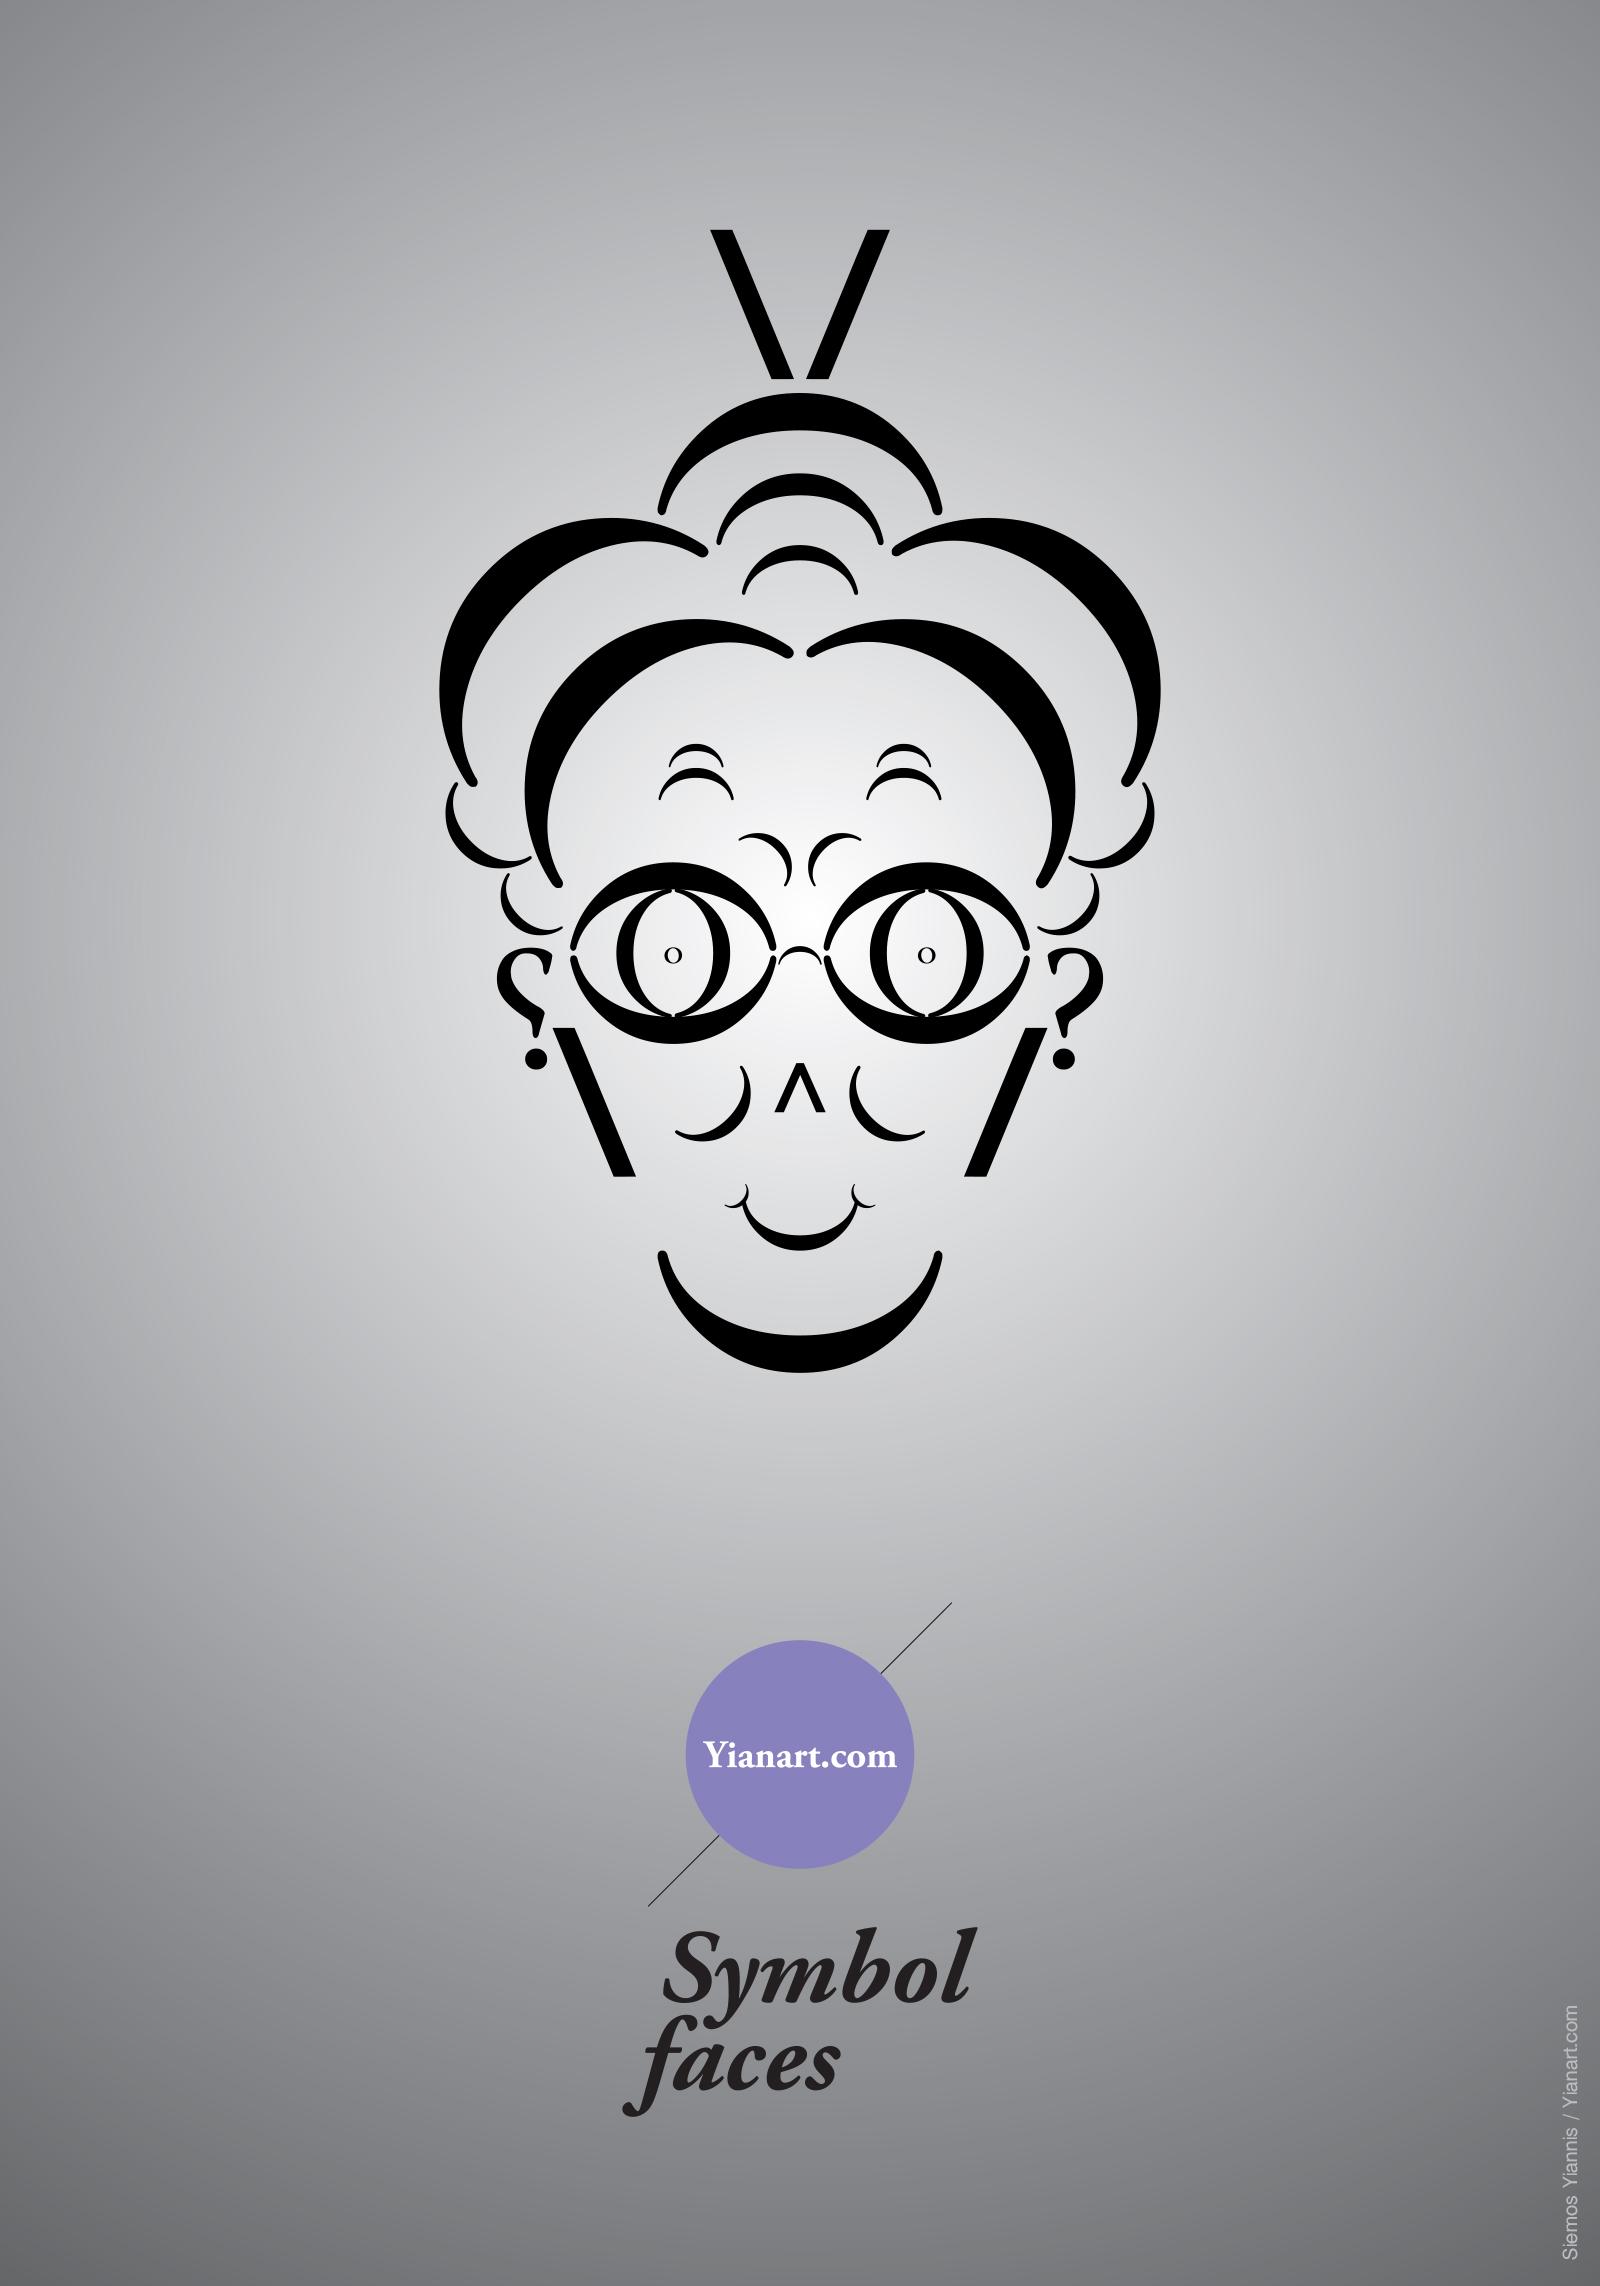 Symbol Faces_11_Yianart.com